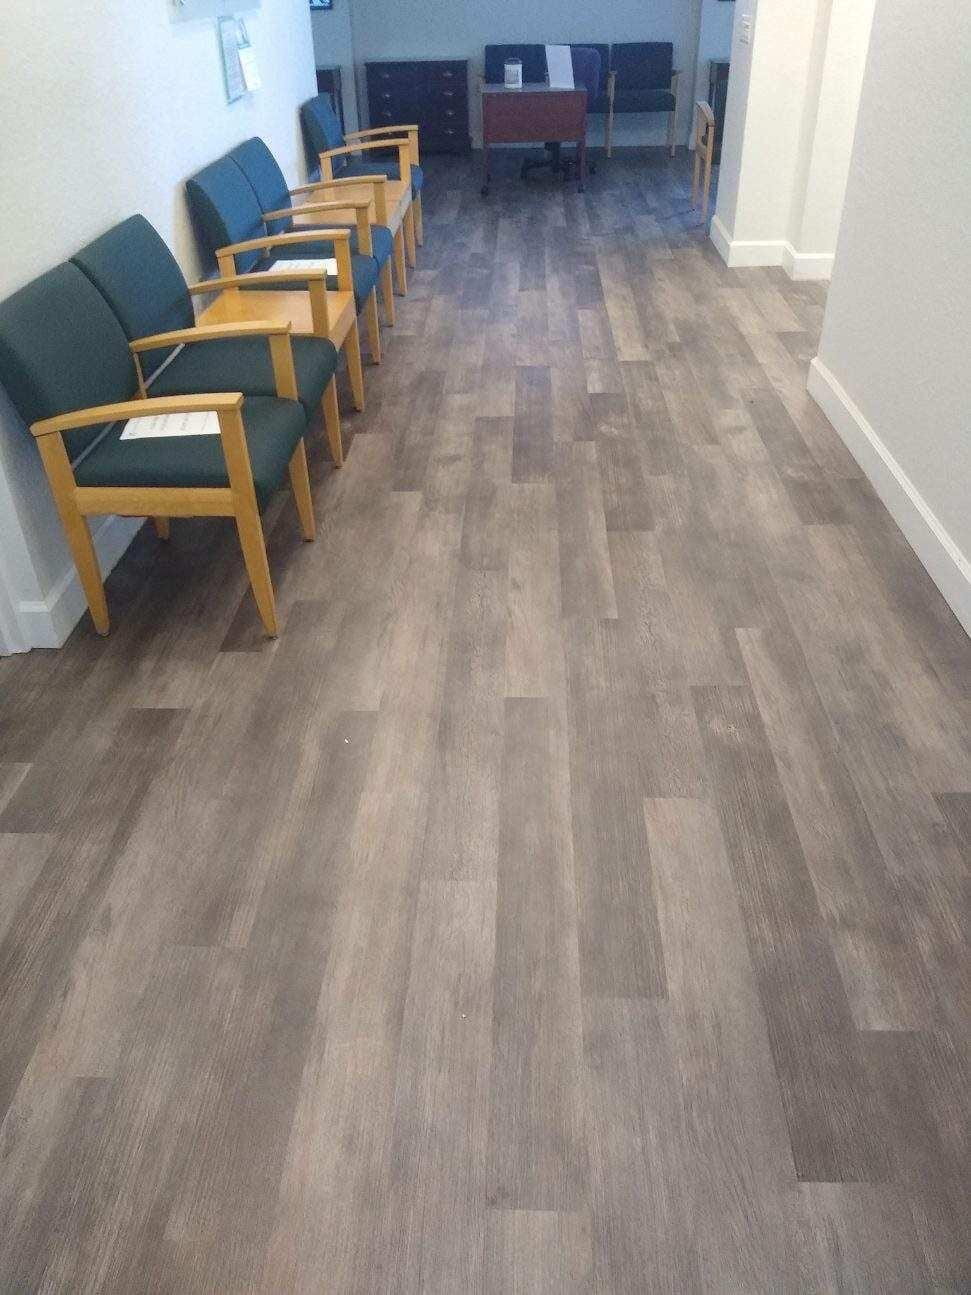 Office flooring installation in Bradenton, FL from Paradise Floors and More